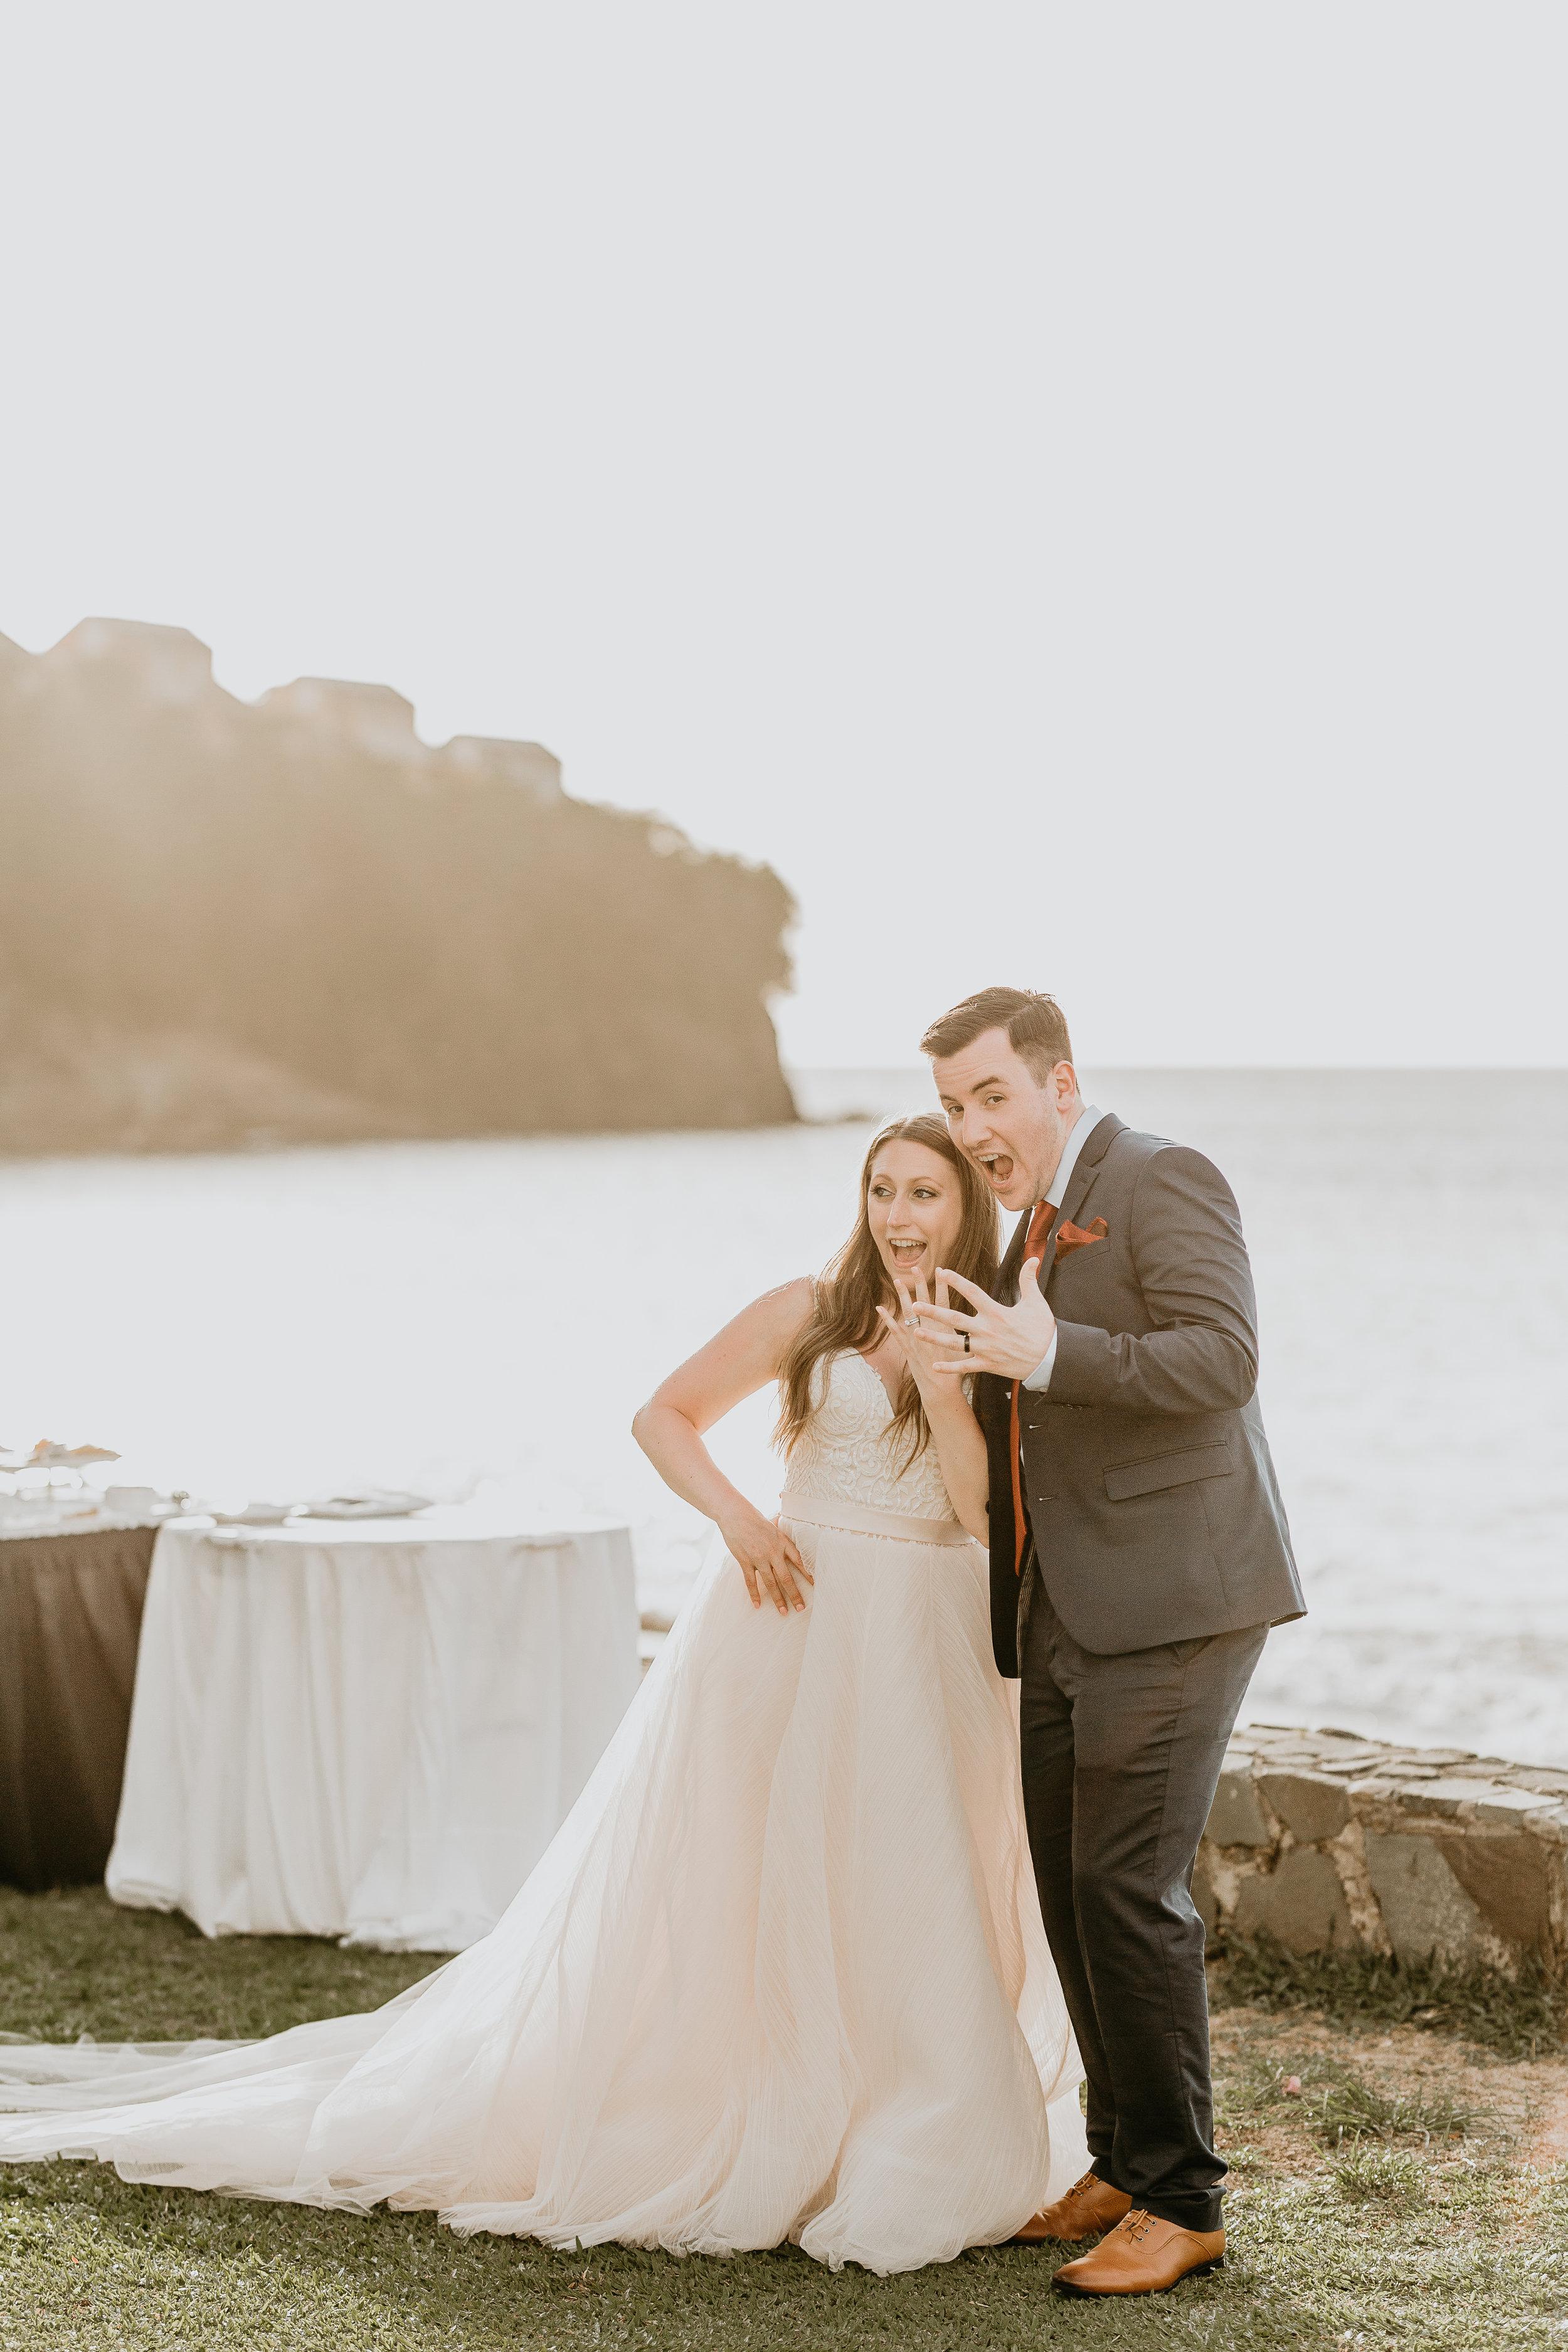 nicole-daacke-photography-destination-wedding-in-st-lucia-sandals-la-toc-intimate-island-wedding-carribean-elopement-photographer-chill-island-wedding-108.jpg